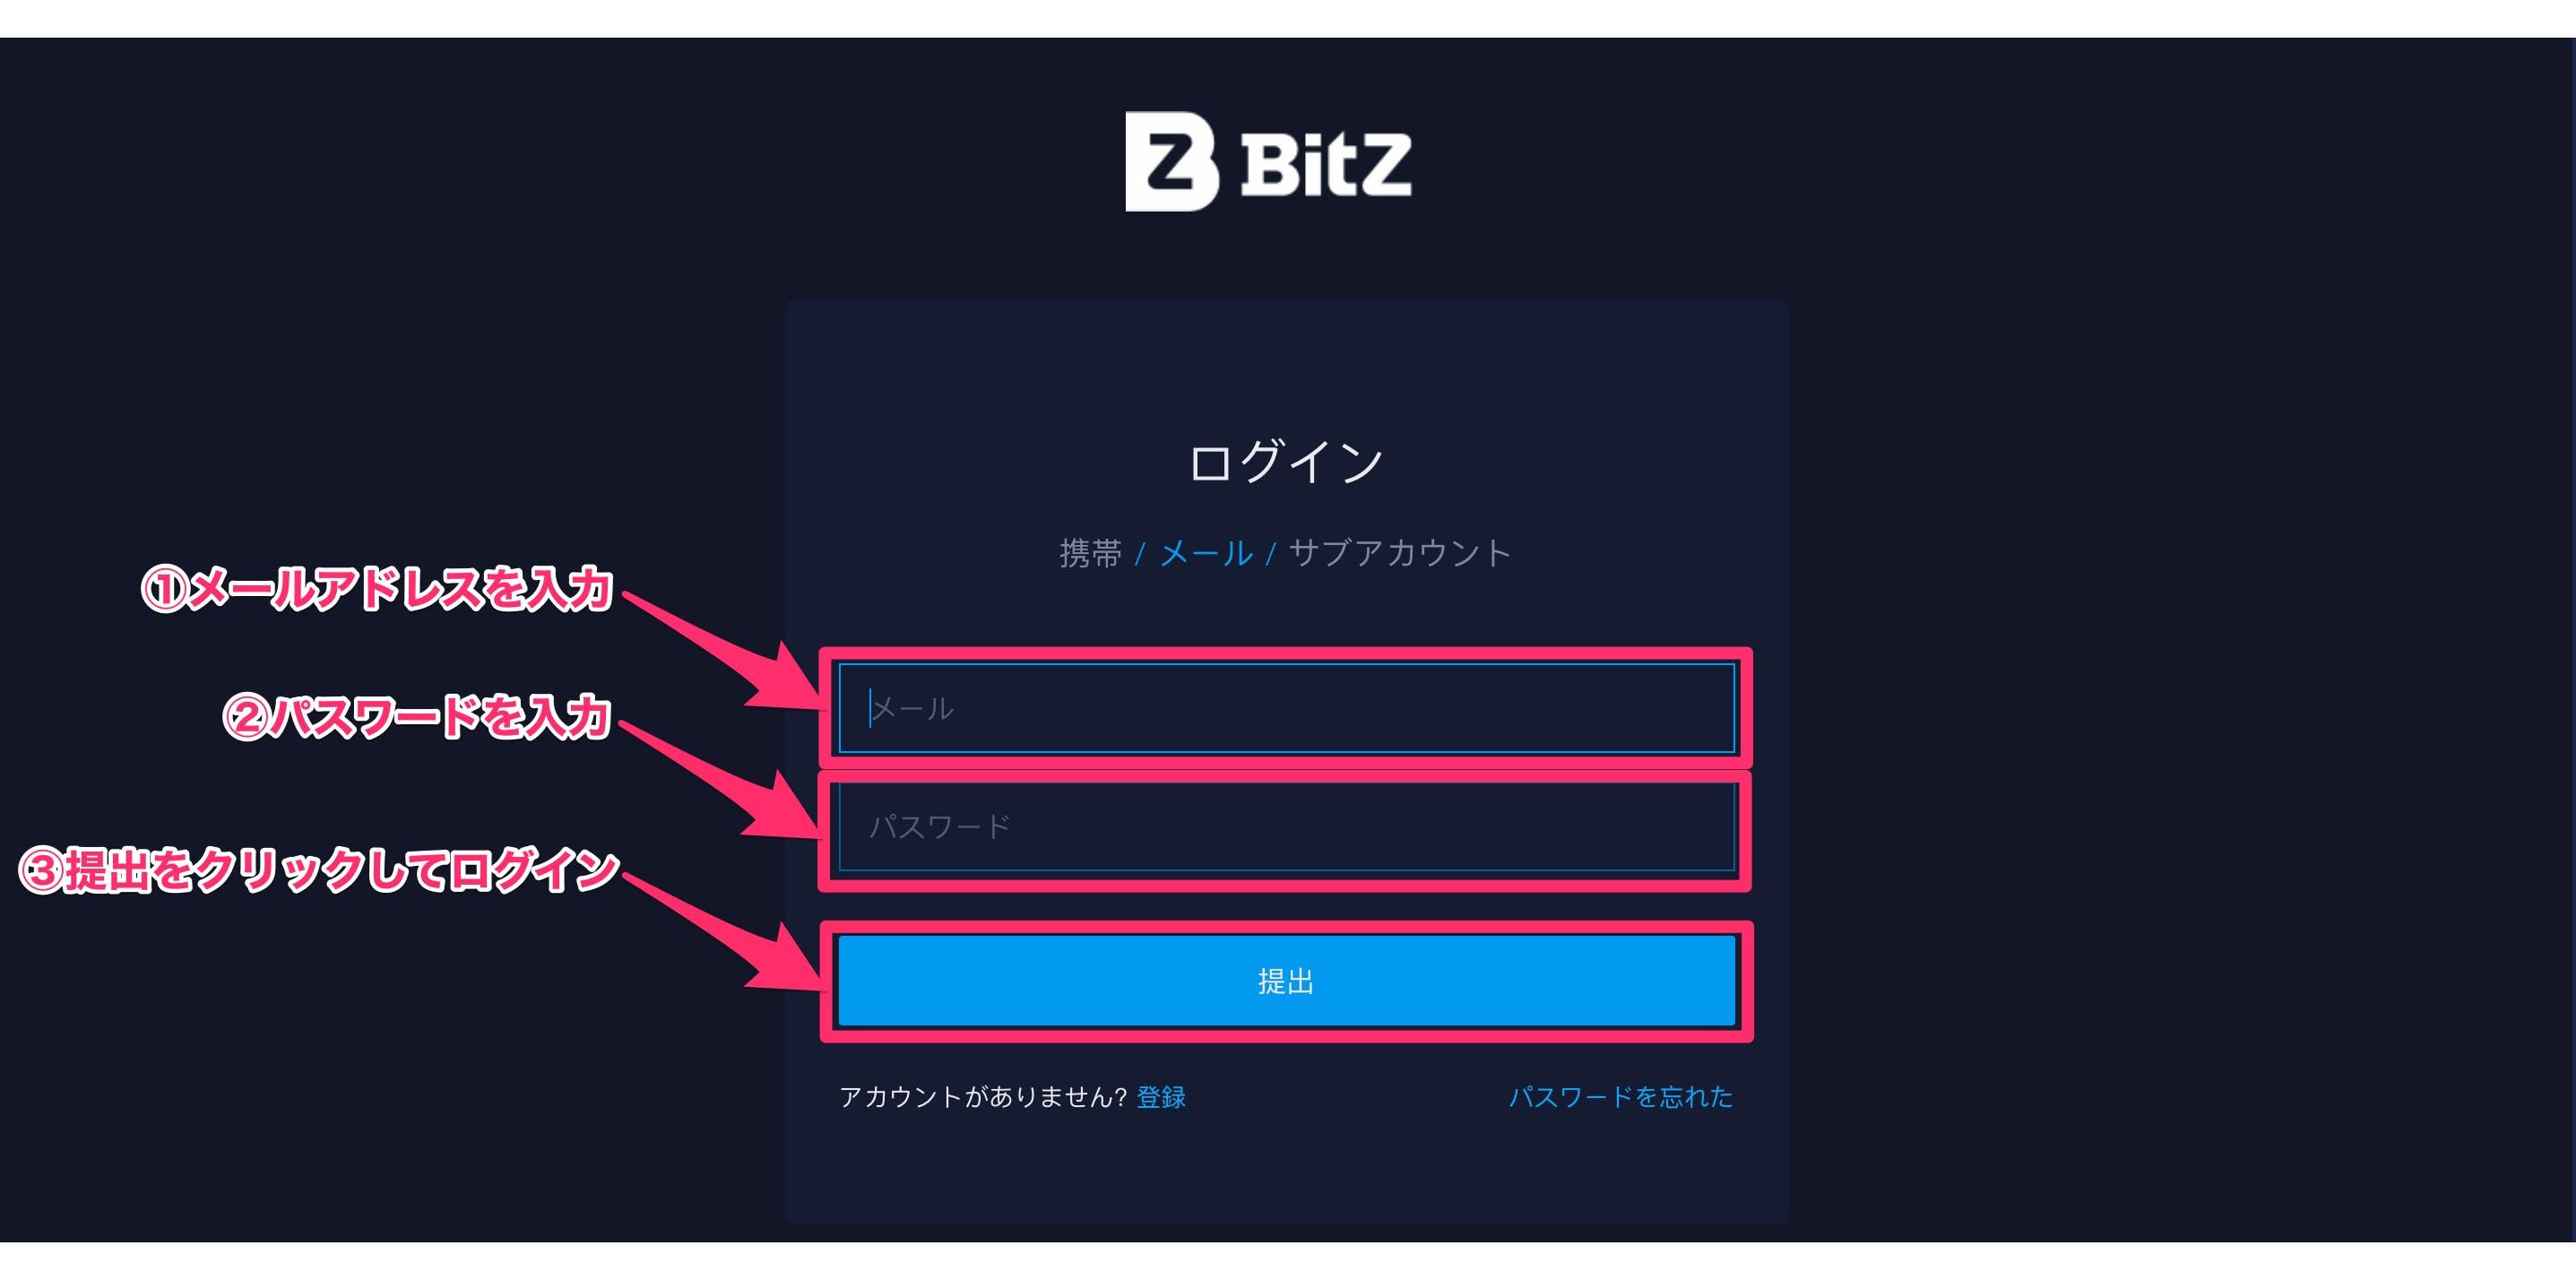 Bit-Zにメールアドレスでログイン